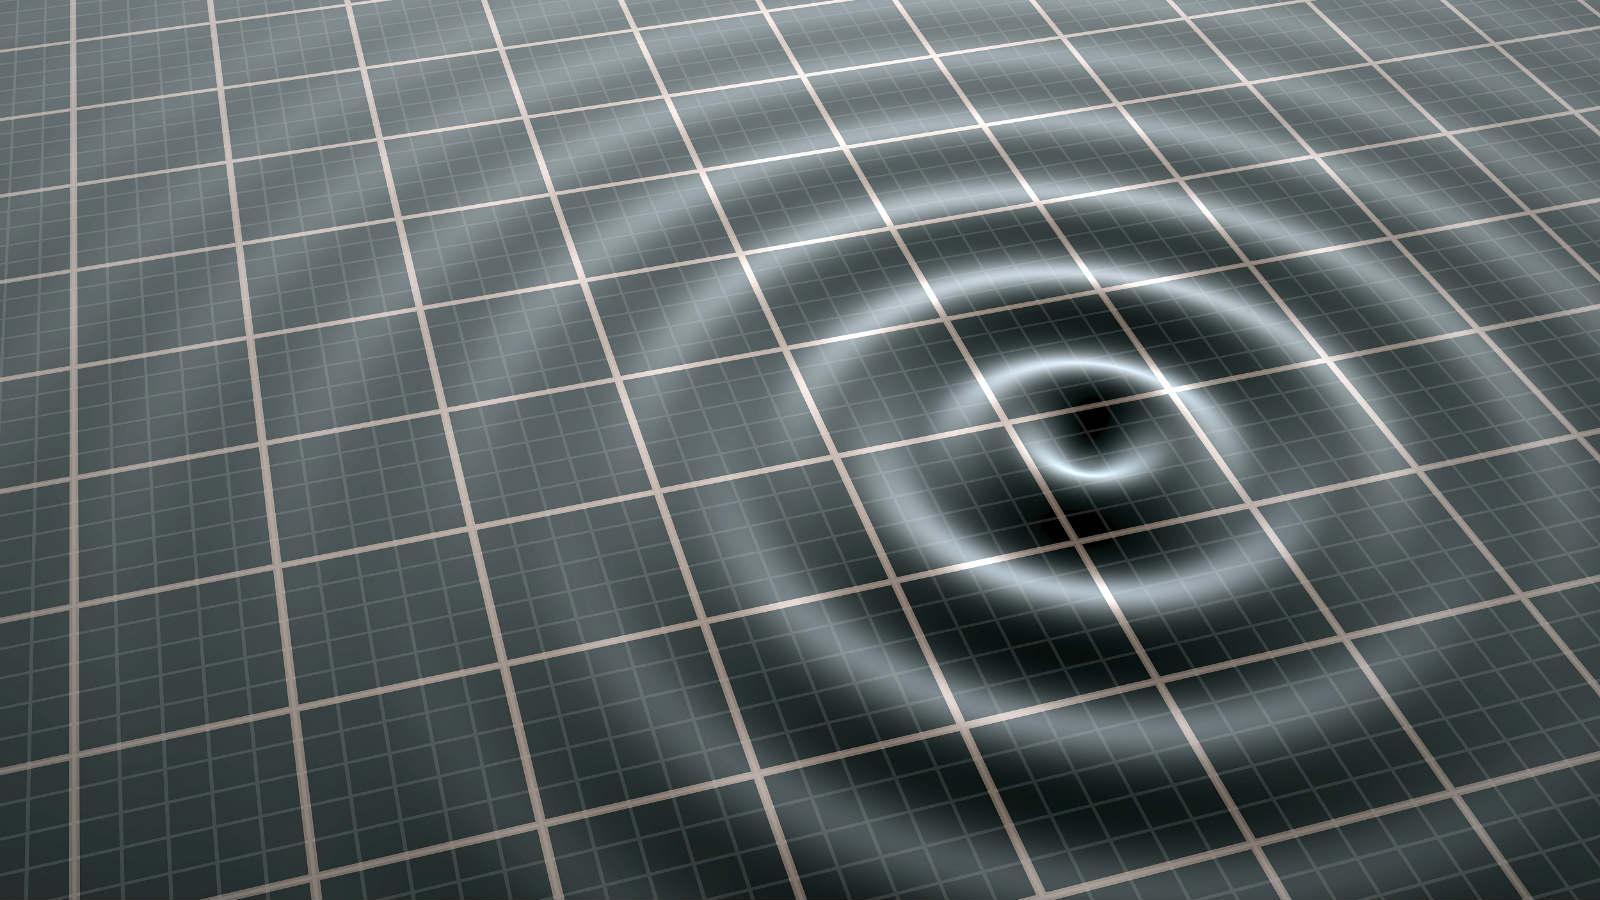 5.1-magnitude quake hits Izu Islands, Japan: USGS